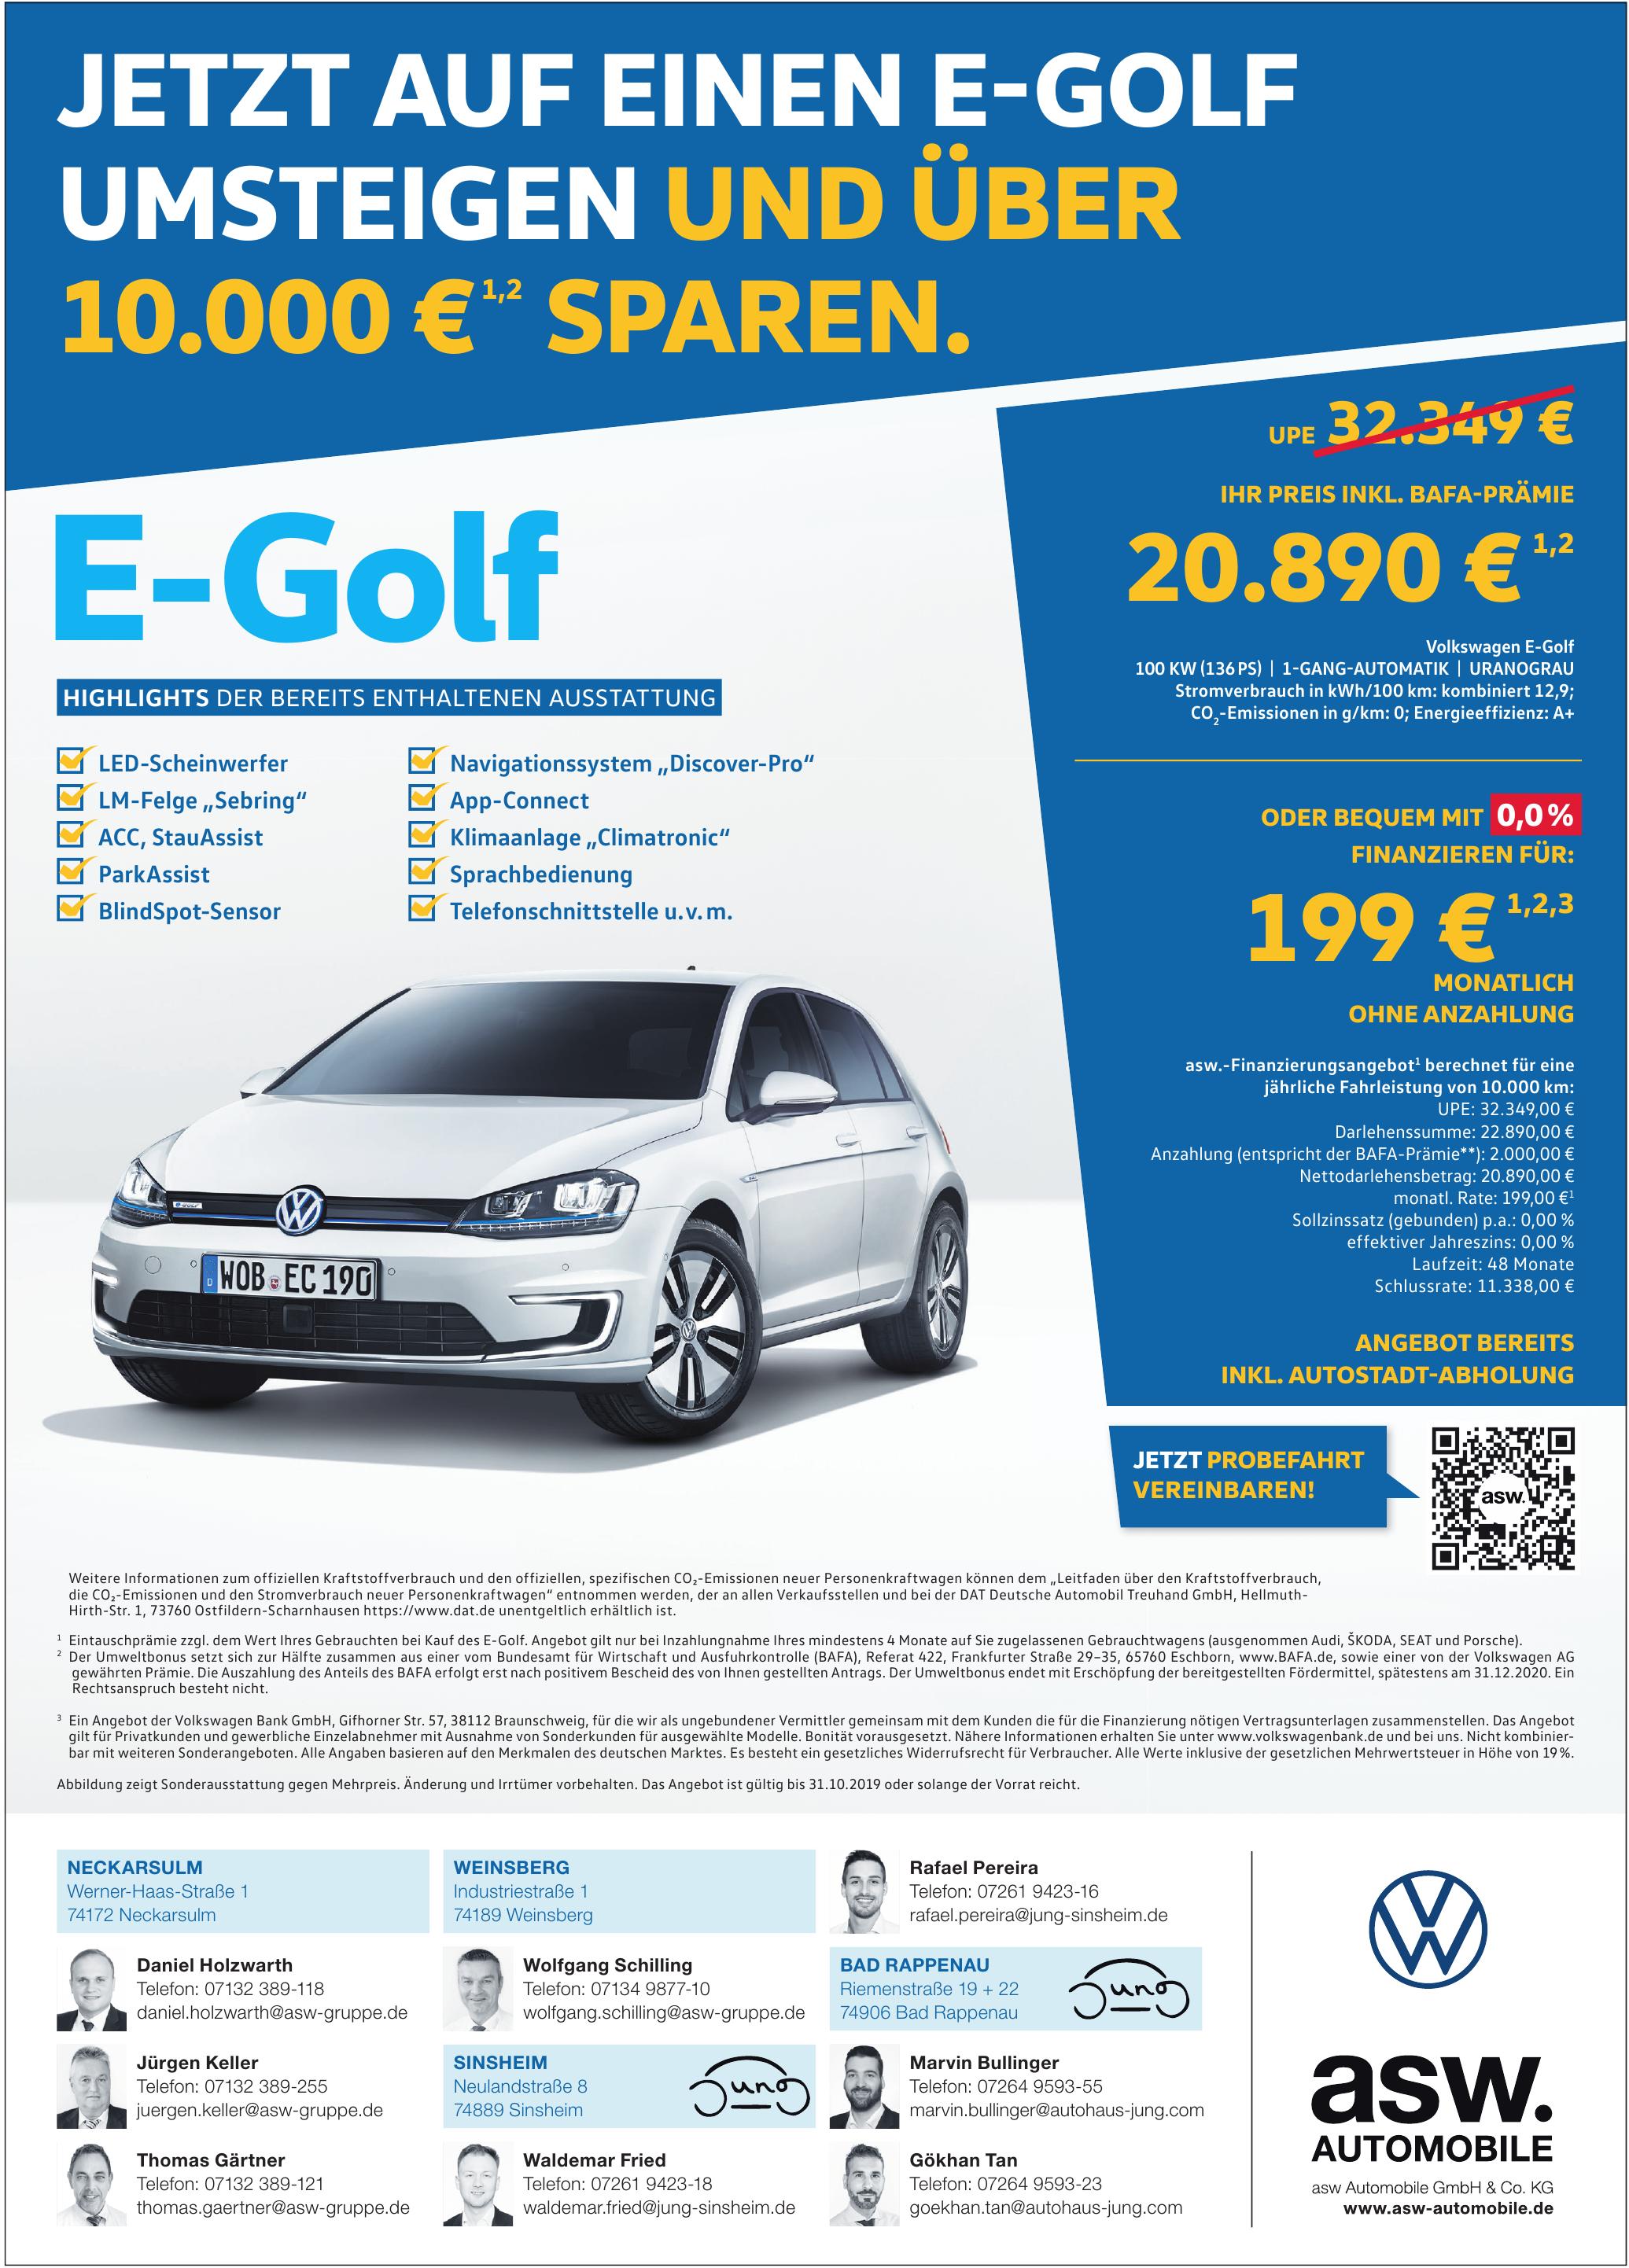 asw Automobile GmbH & Co. KG